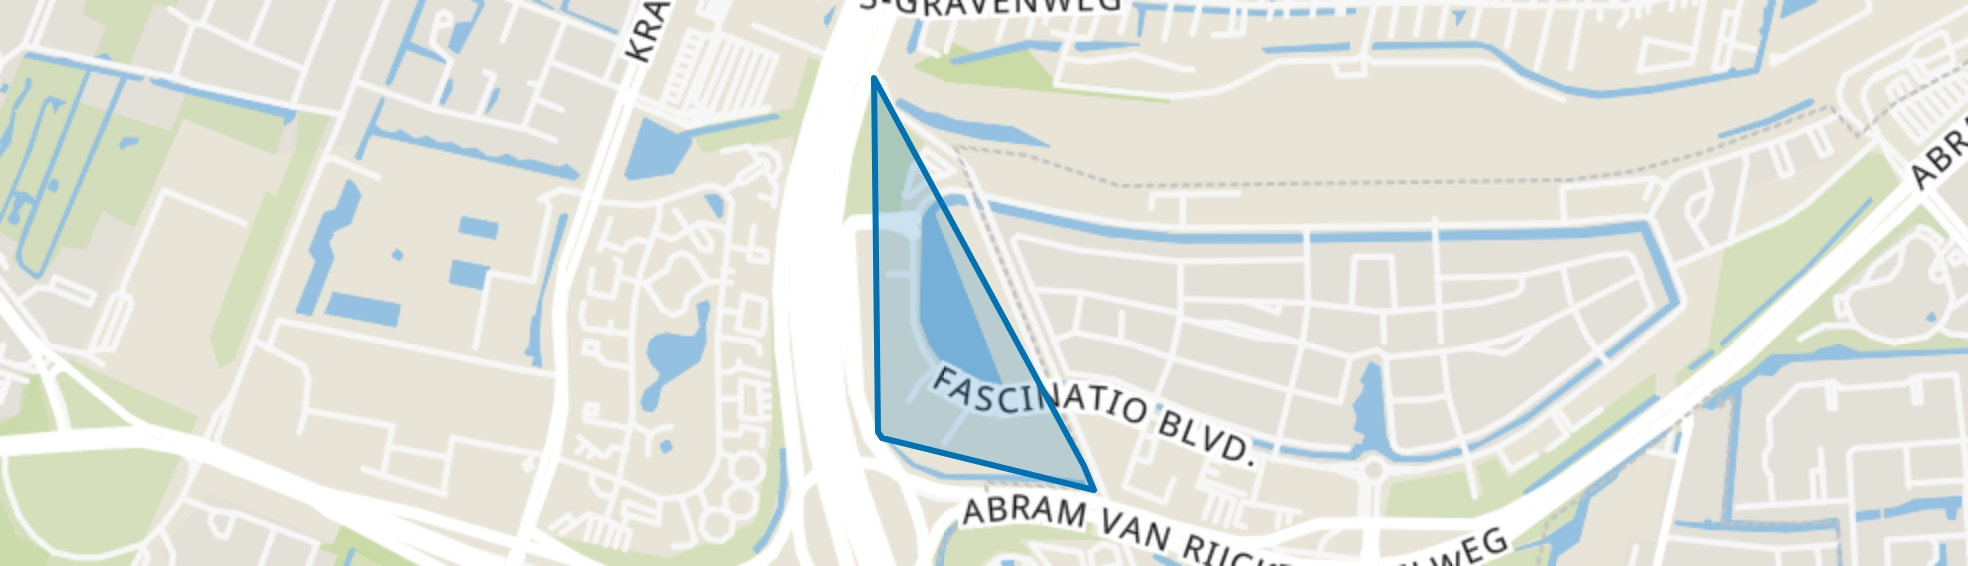 Rivium, Rotterdam map